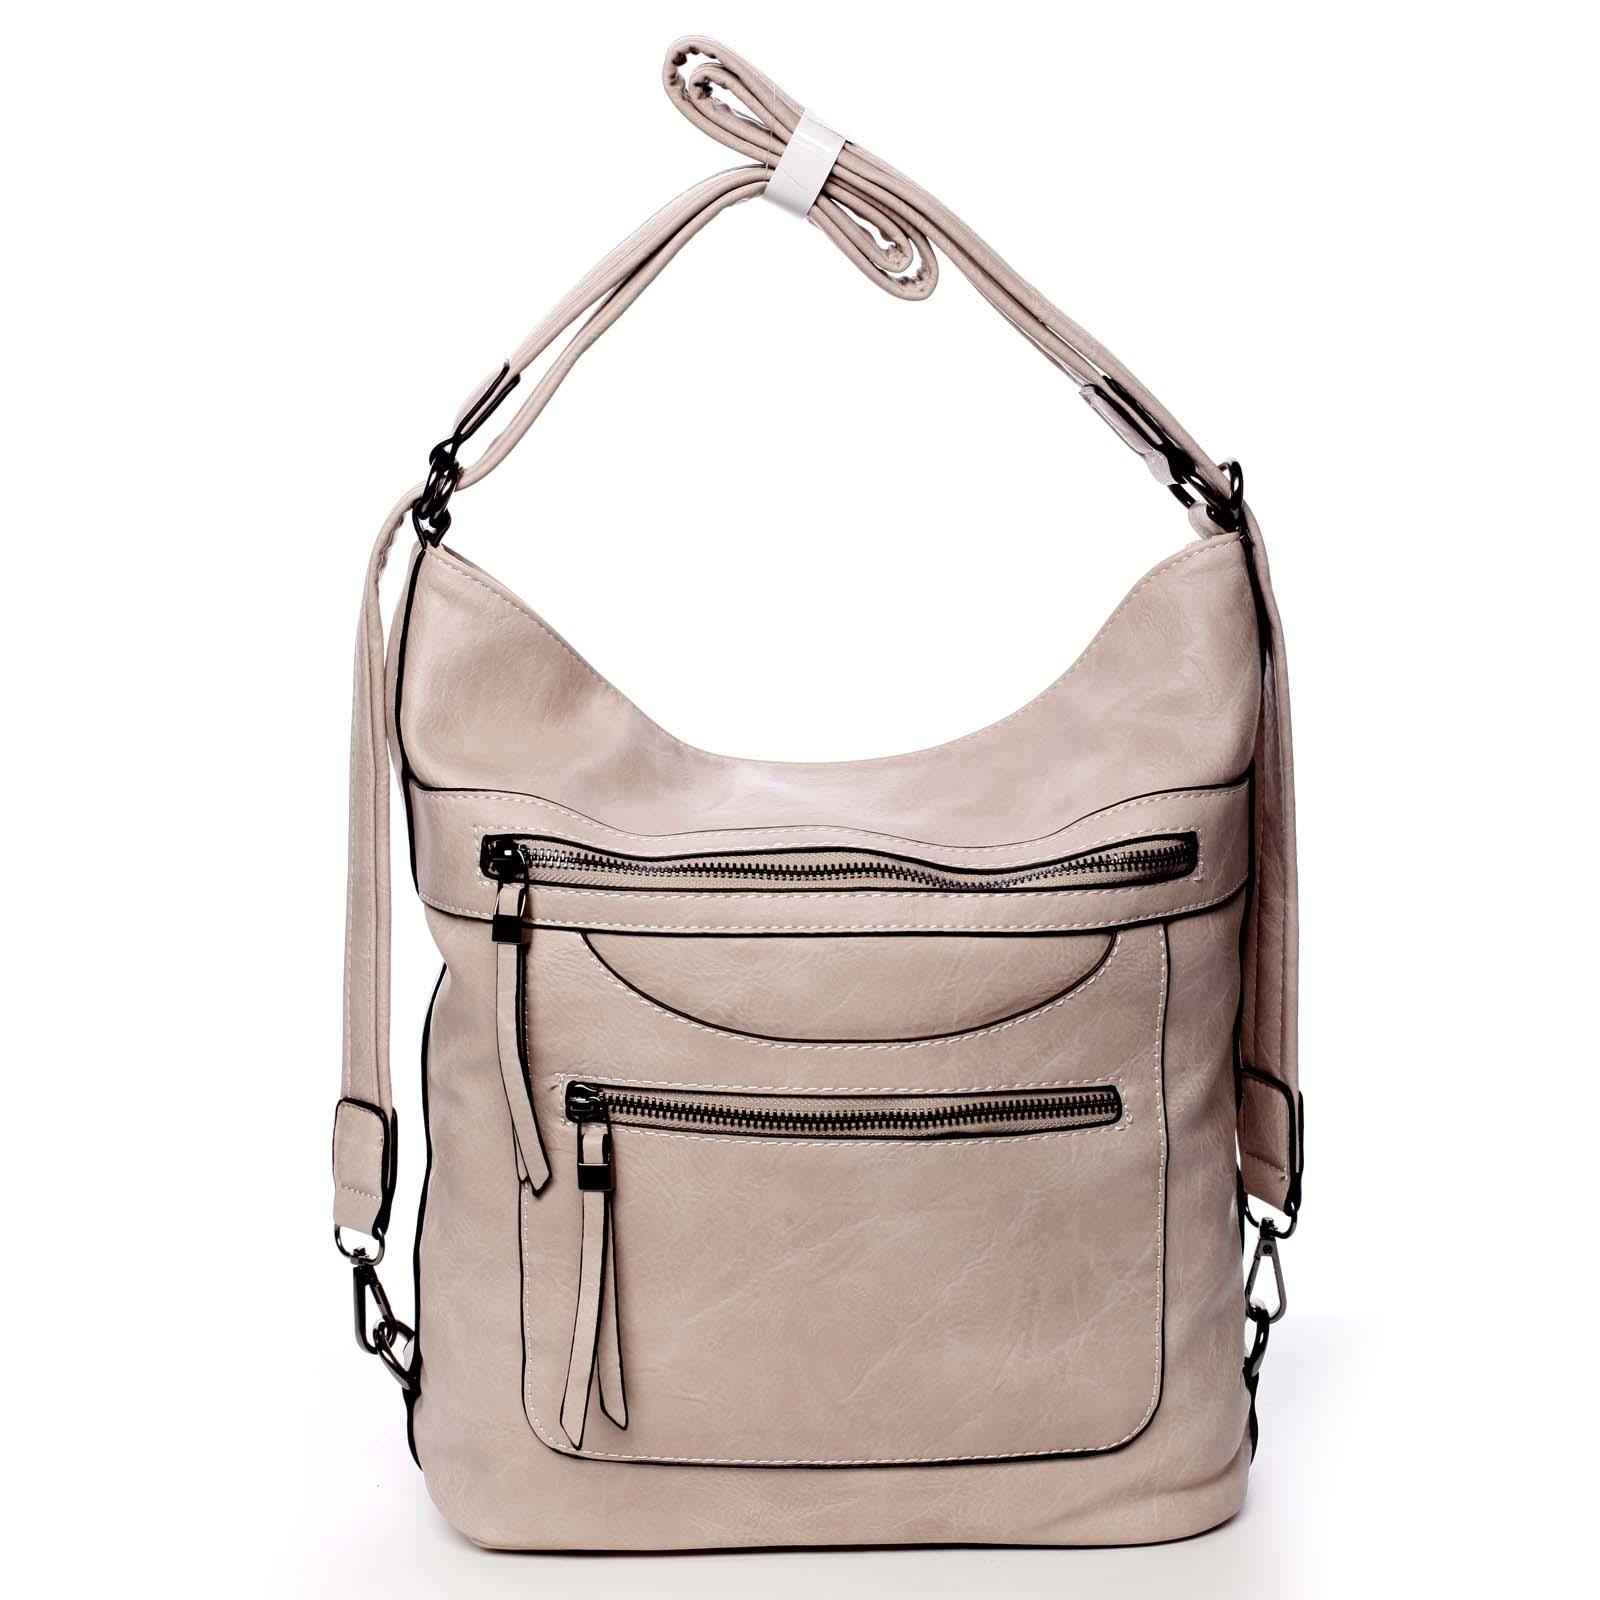 Dámska kabelka batoh svetloružová - Romina Pamila